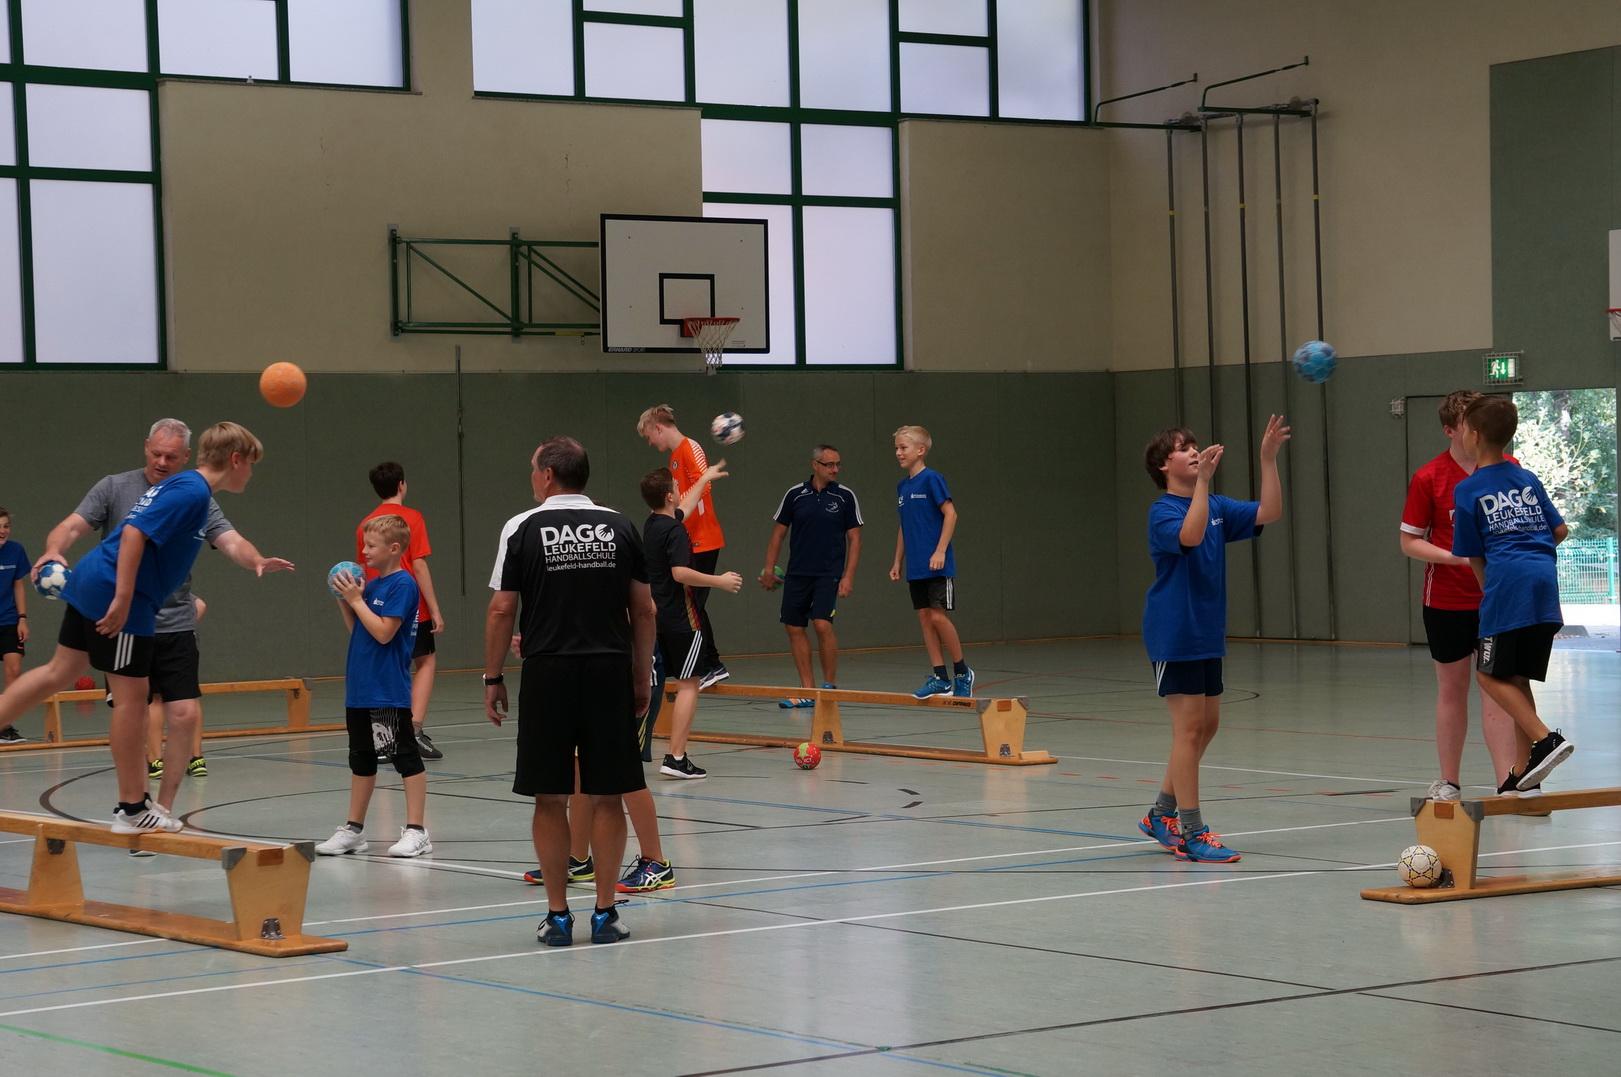 201808_Handballcamp_SDH_MG_181w